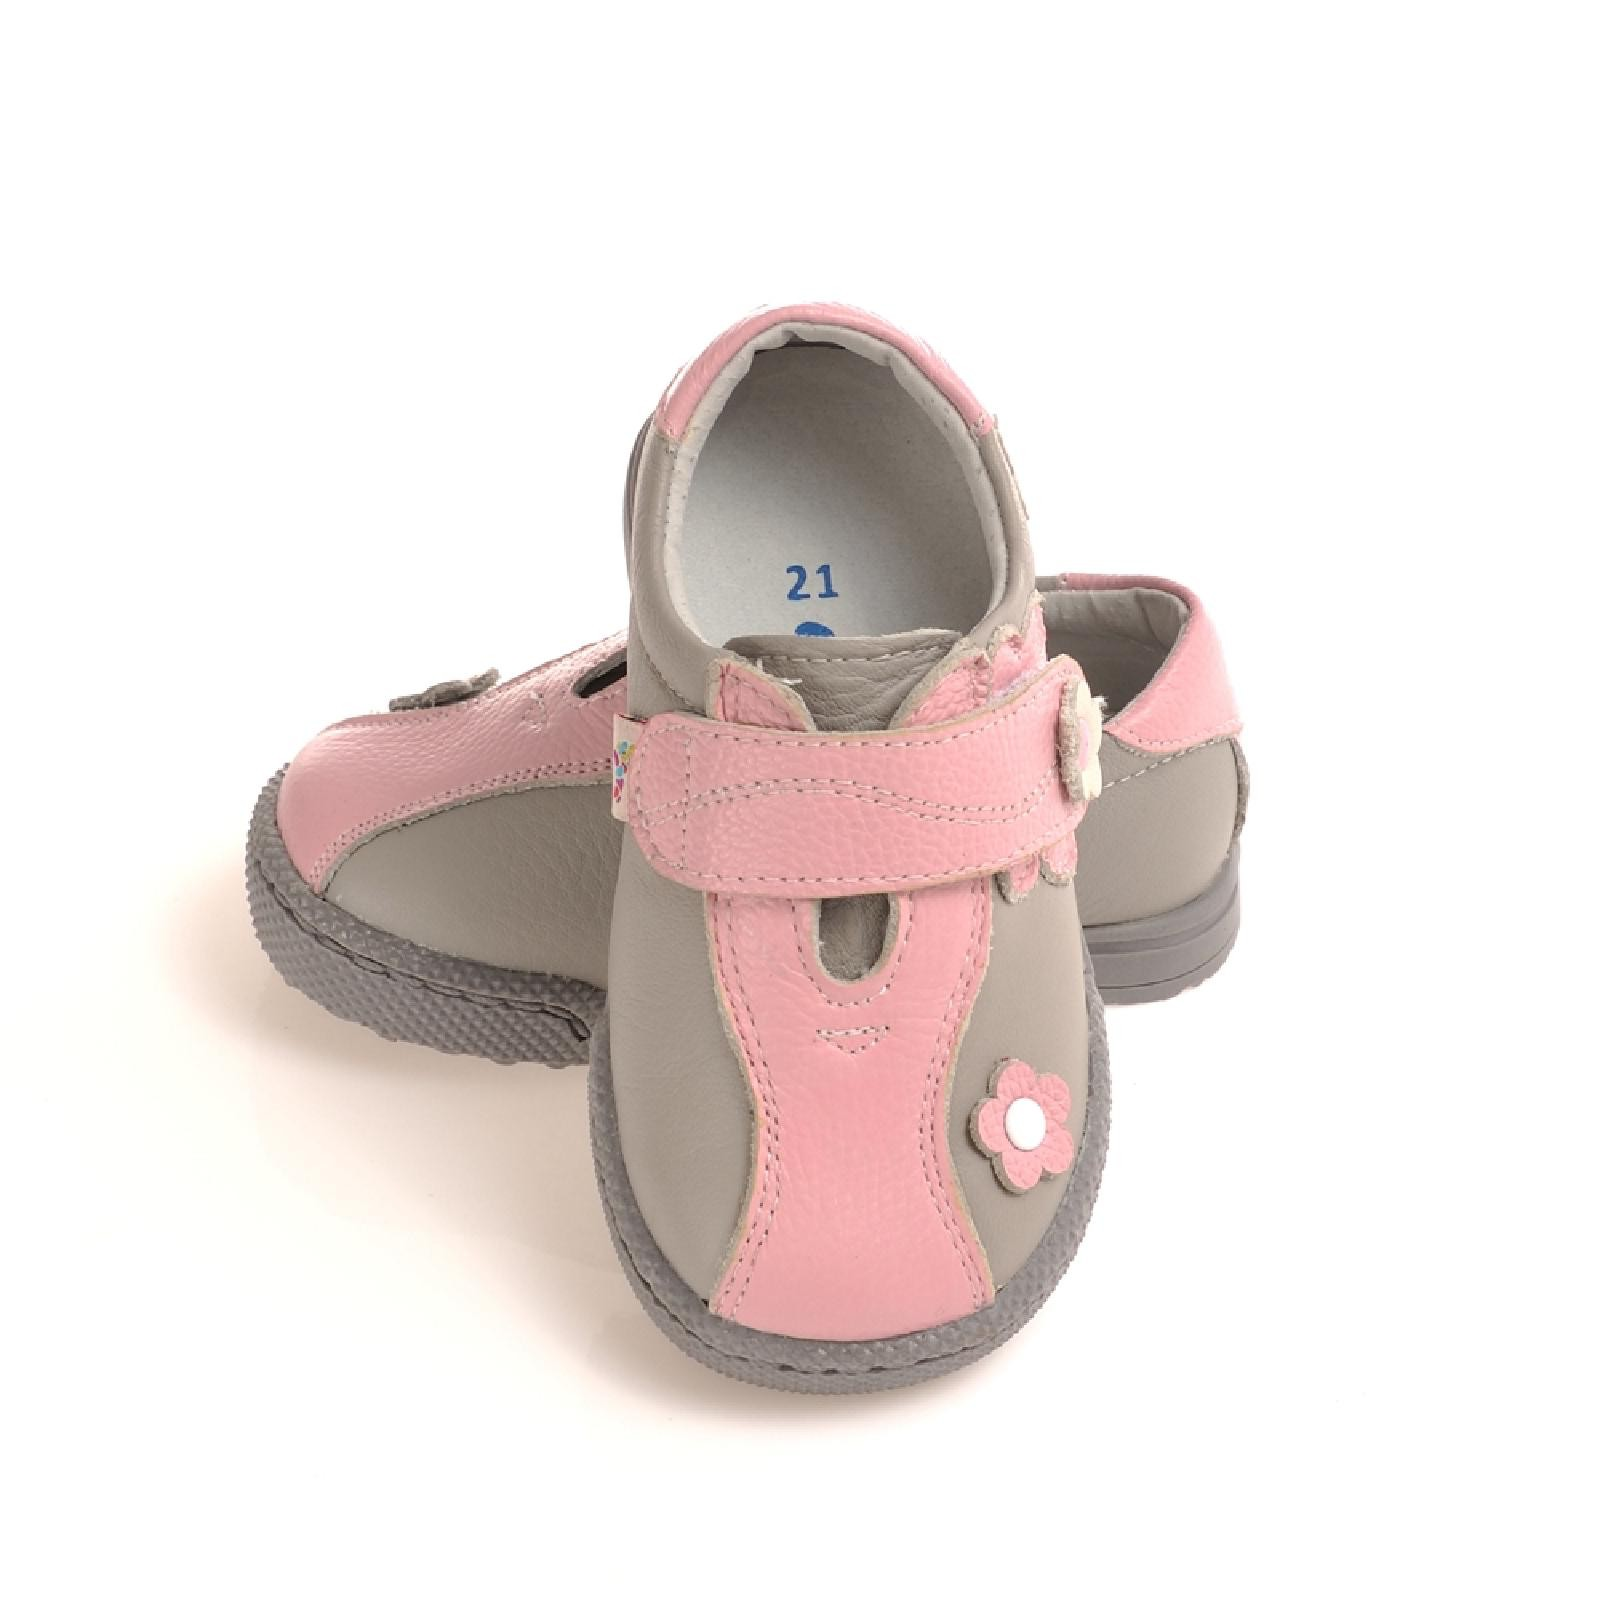 3cea3d15ac0c89 Mehr Ansichten. Caroch Mädchen Sneaker Kinderschuhe aus Leder in rosa  hellgrau